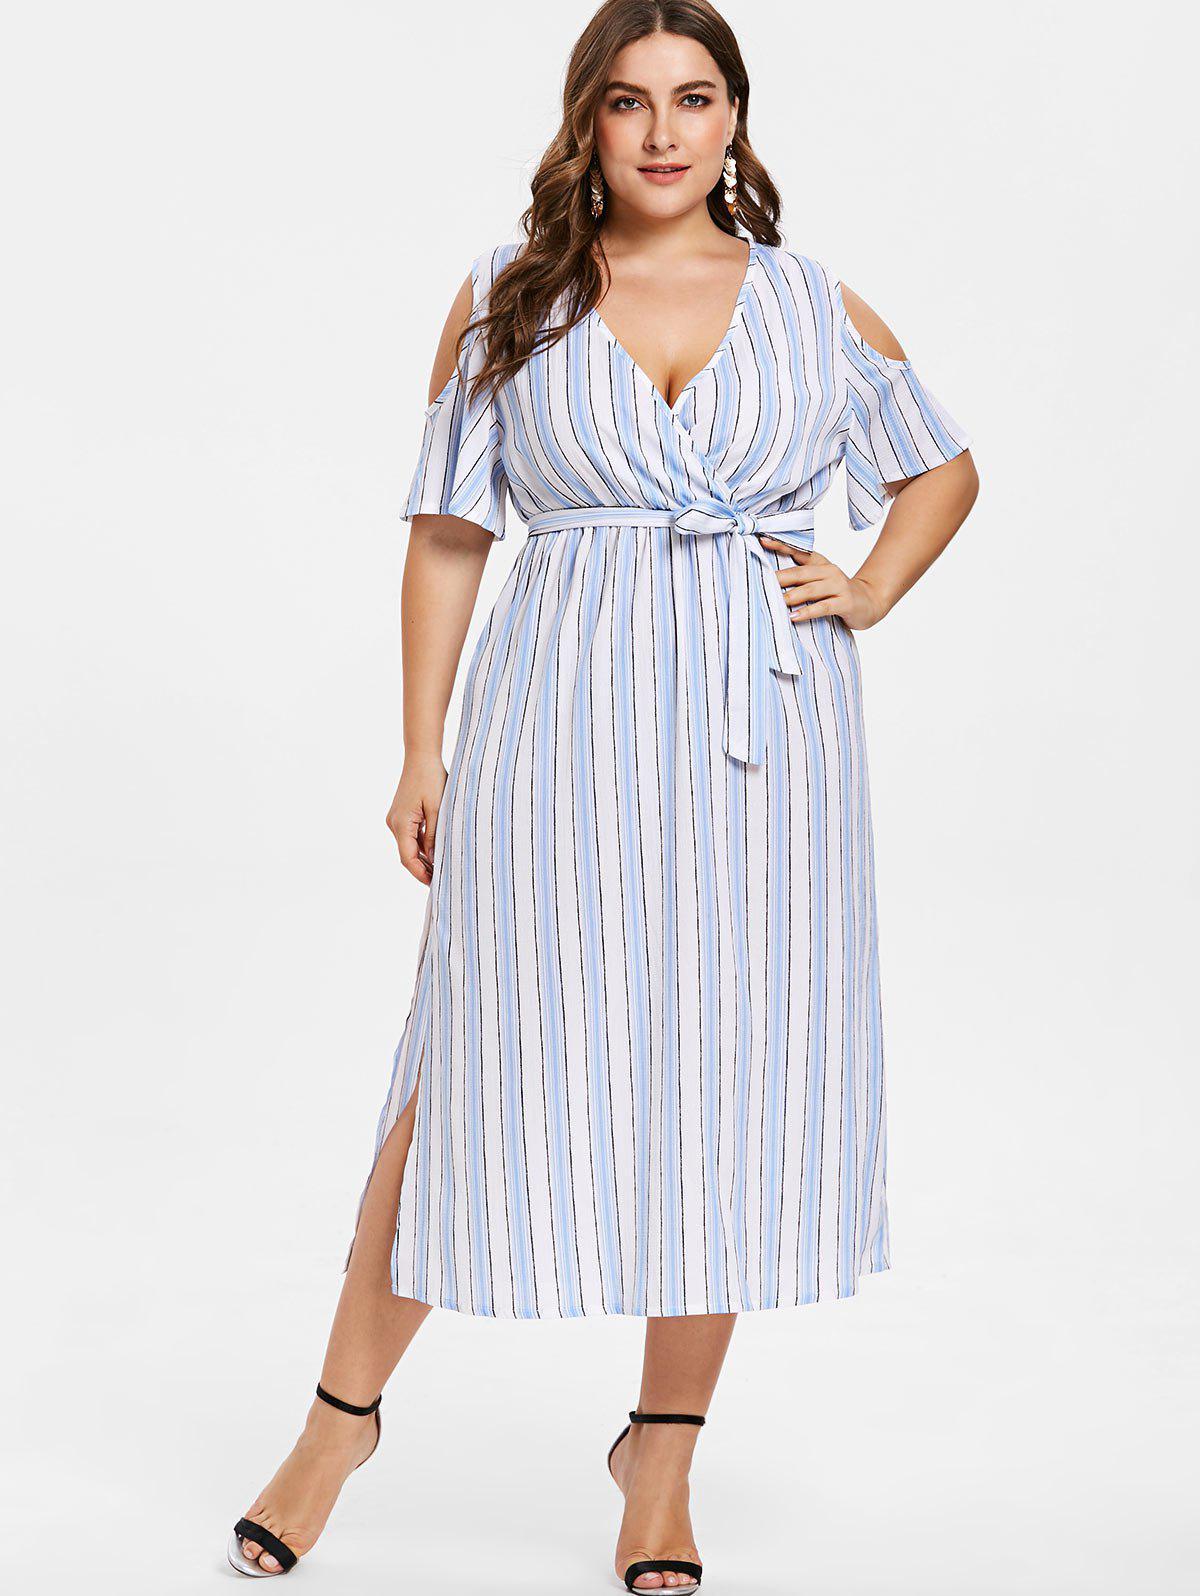 Plus Size Striped Surplice Open Shoulder Dress 284123802